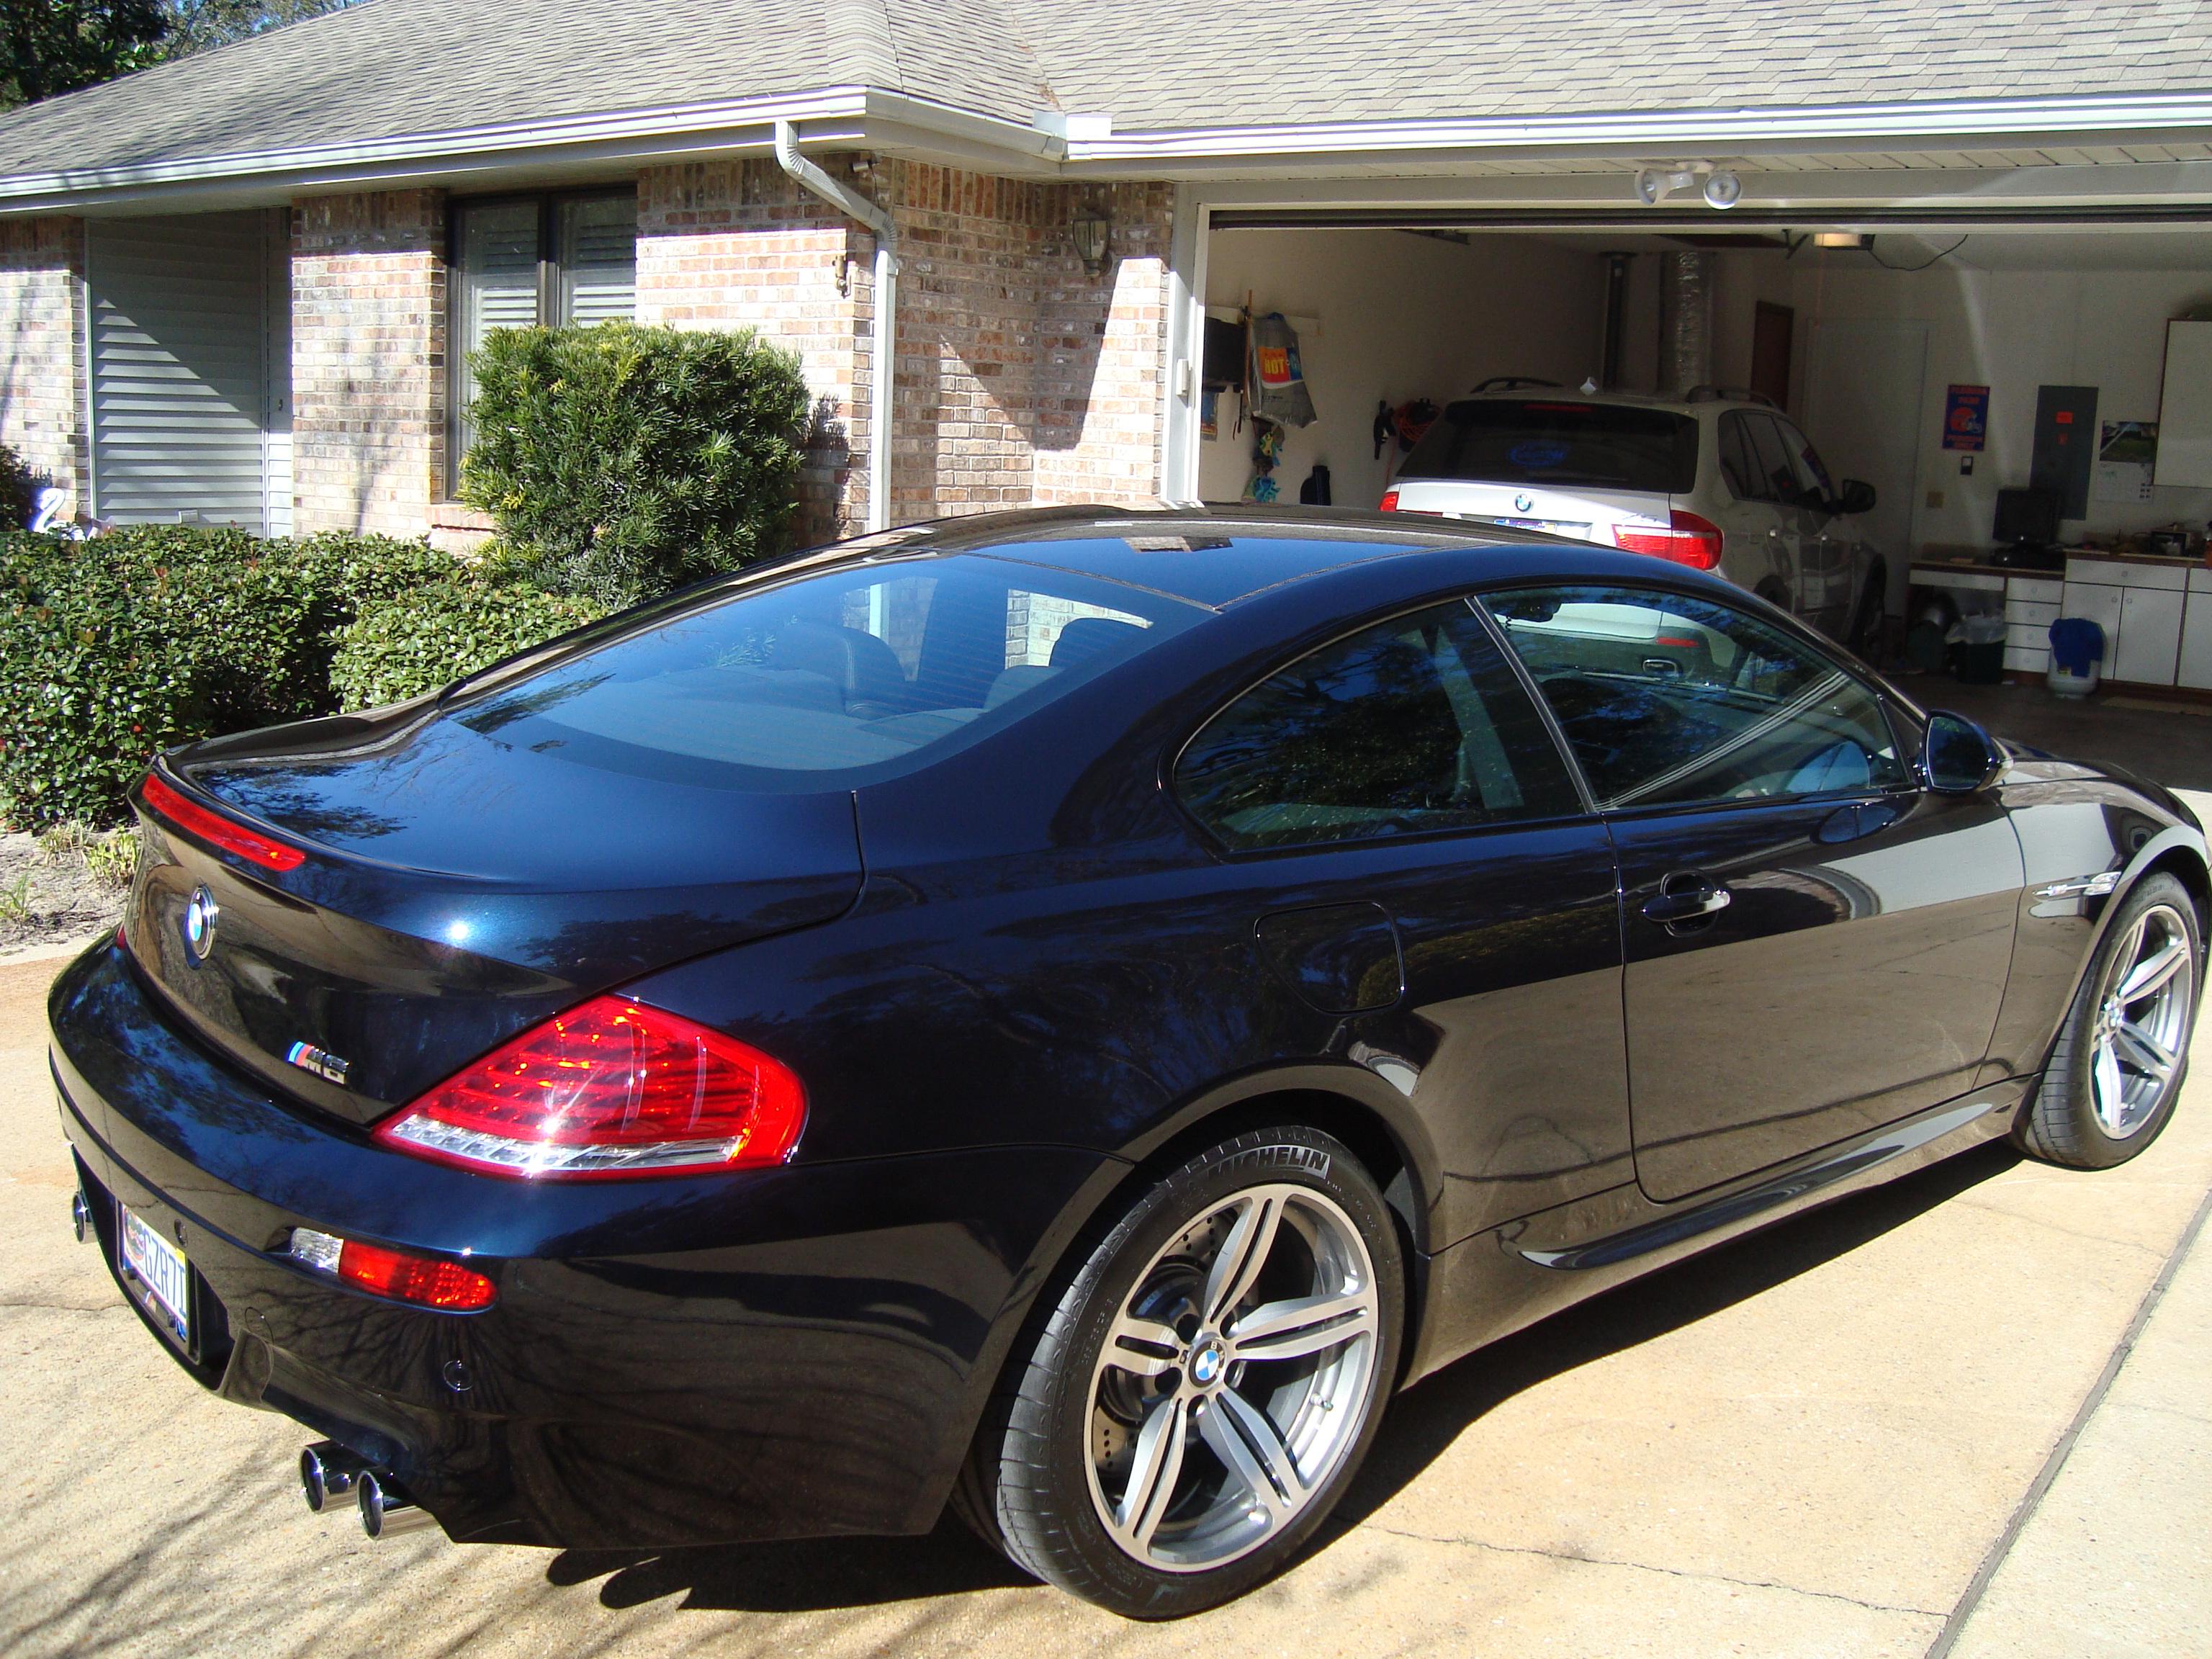 Memebr Bill Grant 2010 BMW M6 Coupe Carbon Black, Back in the Fold  from Porsche 997 Turbo-dsc01298.jpg